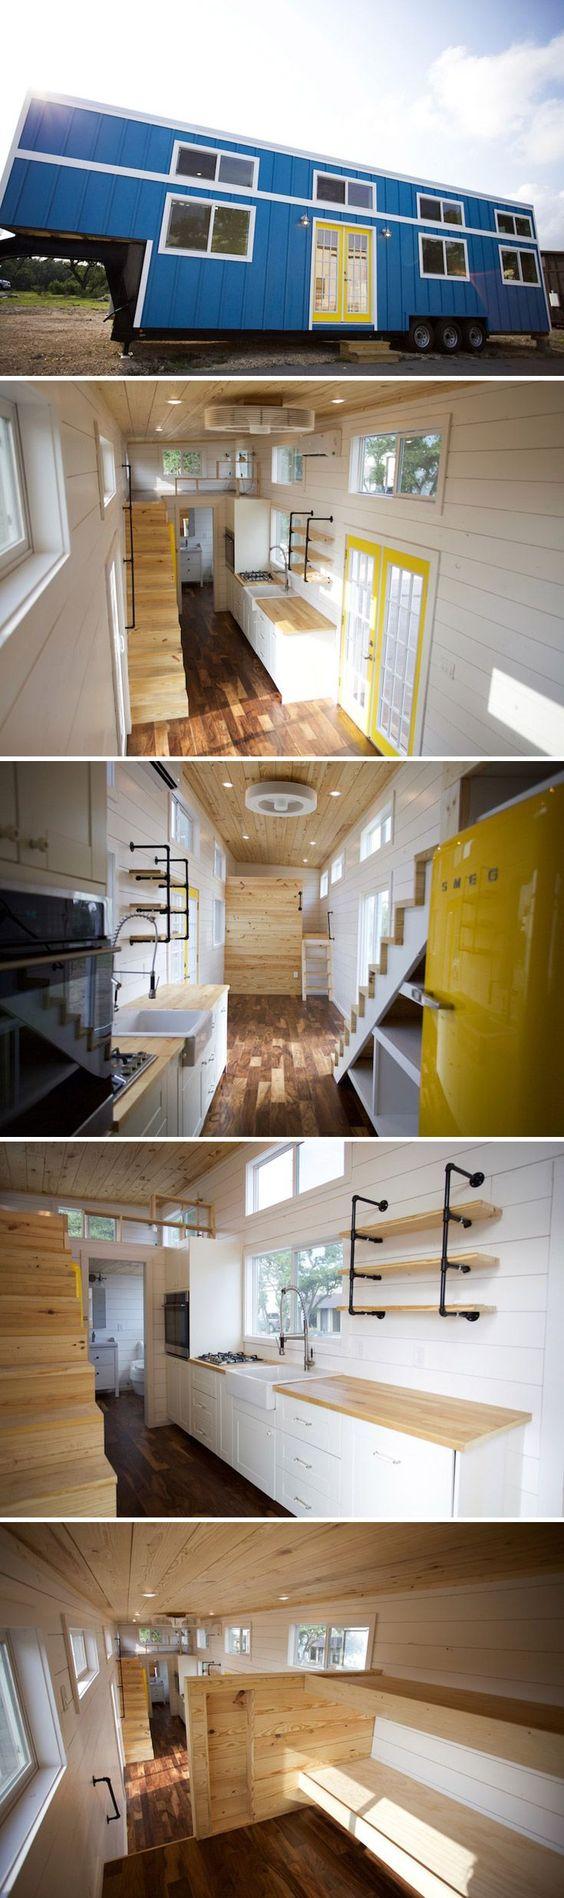 Charming Interior Ideas